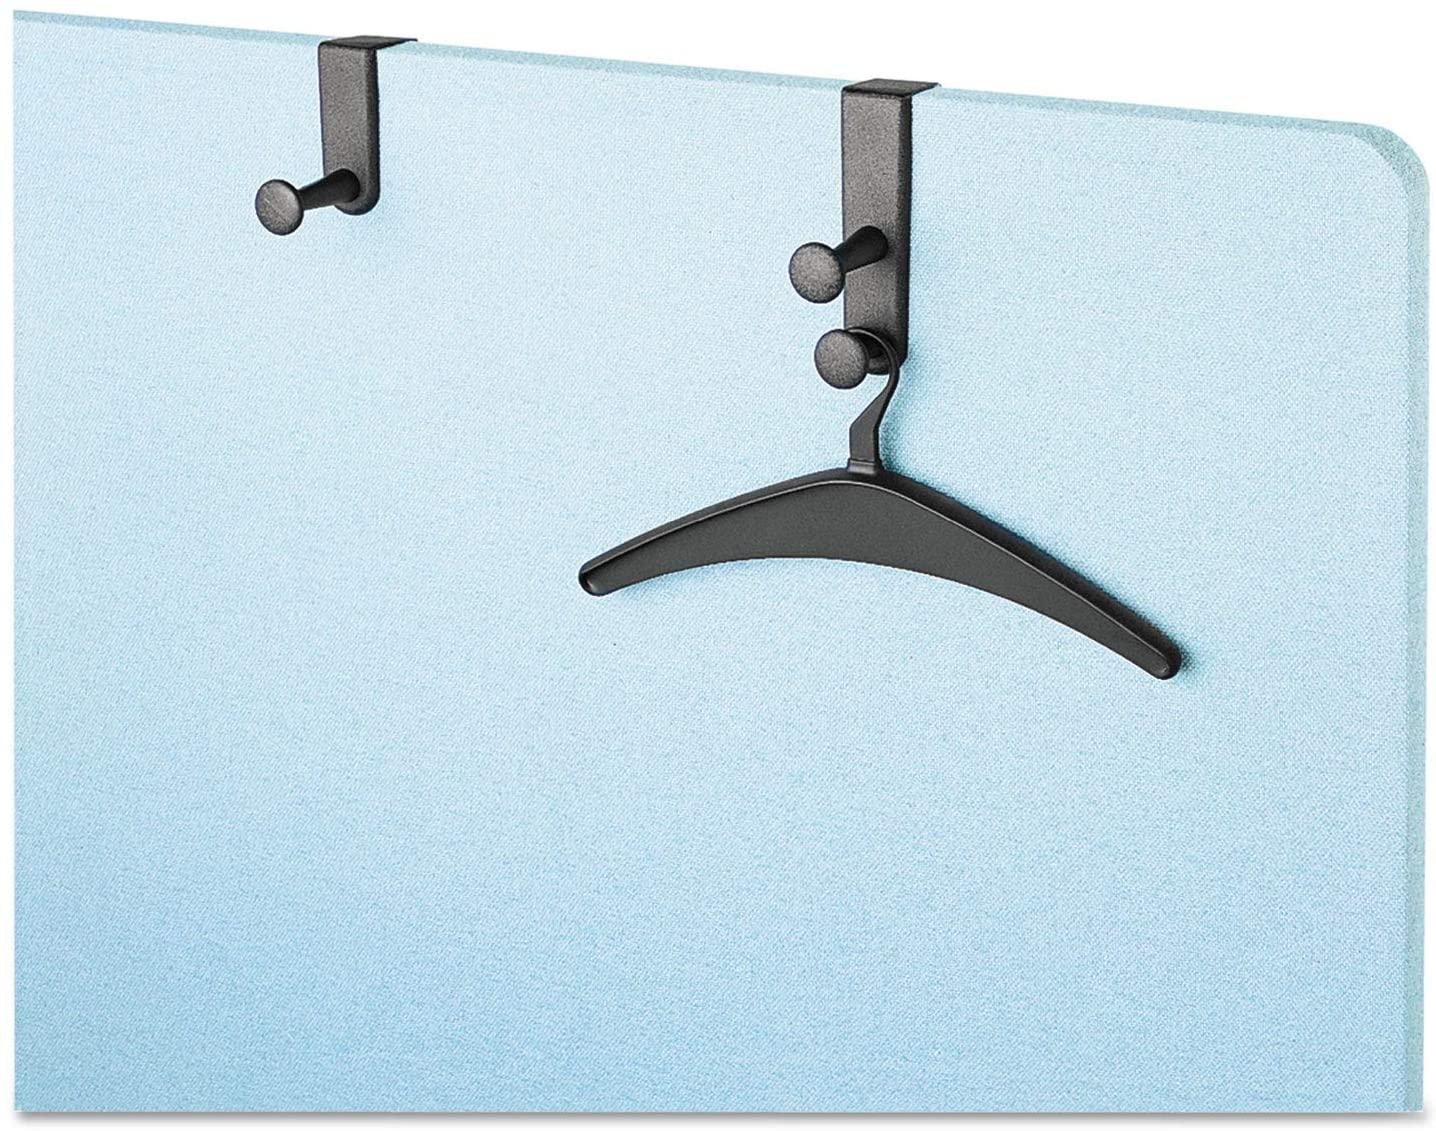 Quartet 20701 - Over-The-Panel Hook with Steel Single-Garment Hanger, 1 3/4 x 4 1/2, Black-QRT20701